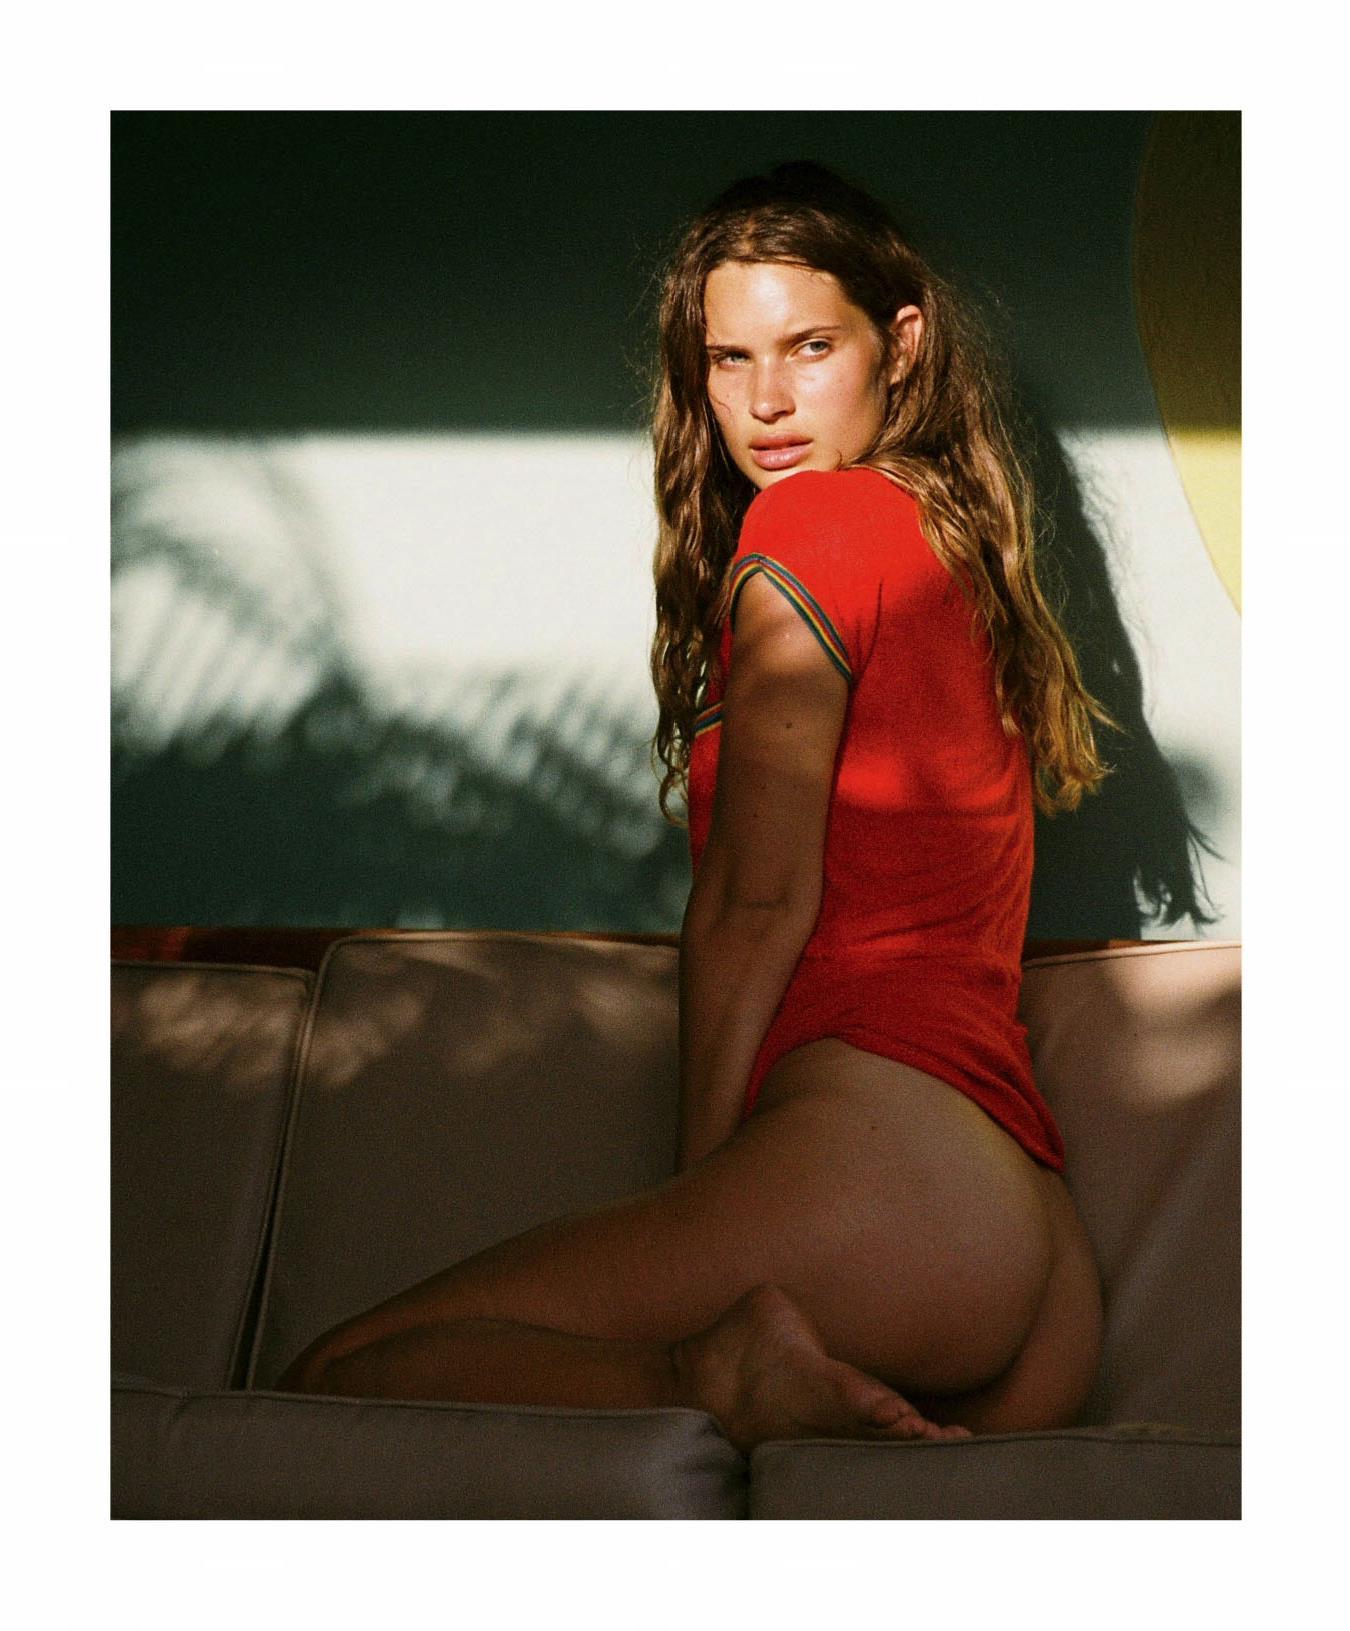 Topless Lise Olsen nude (99 photo), Pussy, Bikini, Selfie, see through 2019